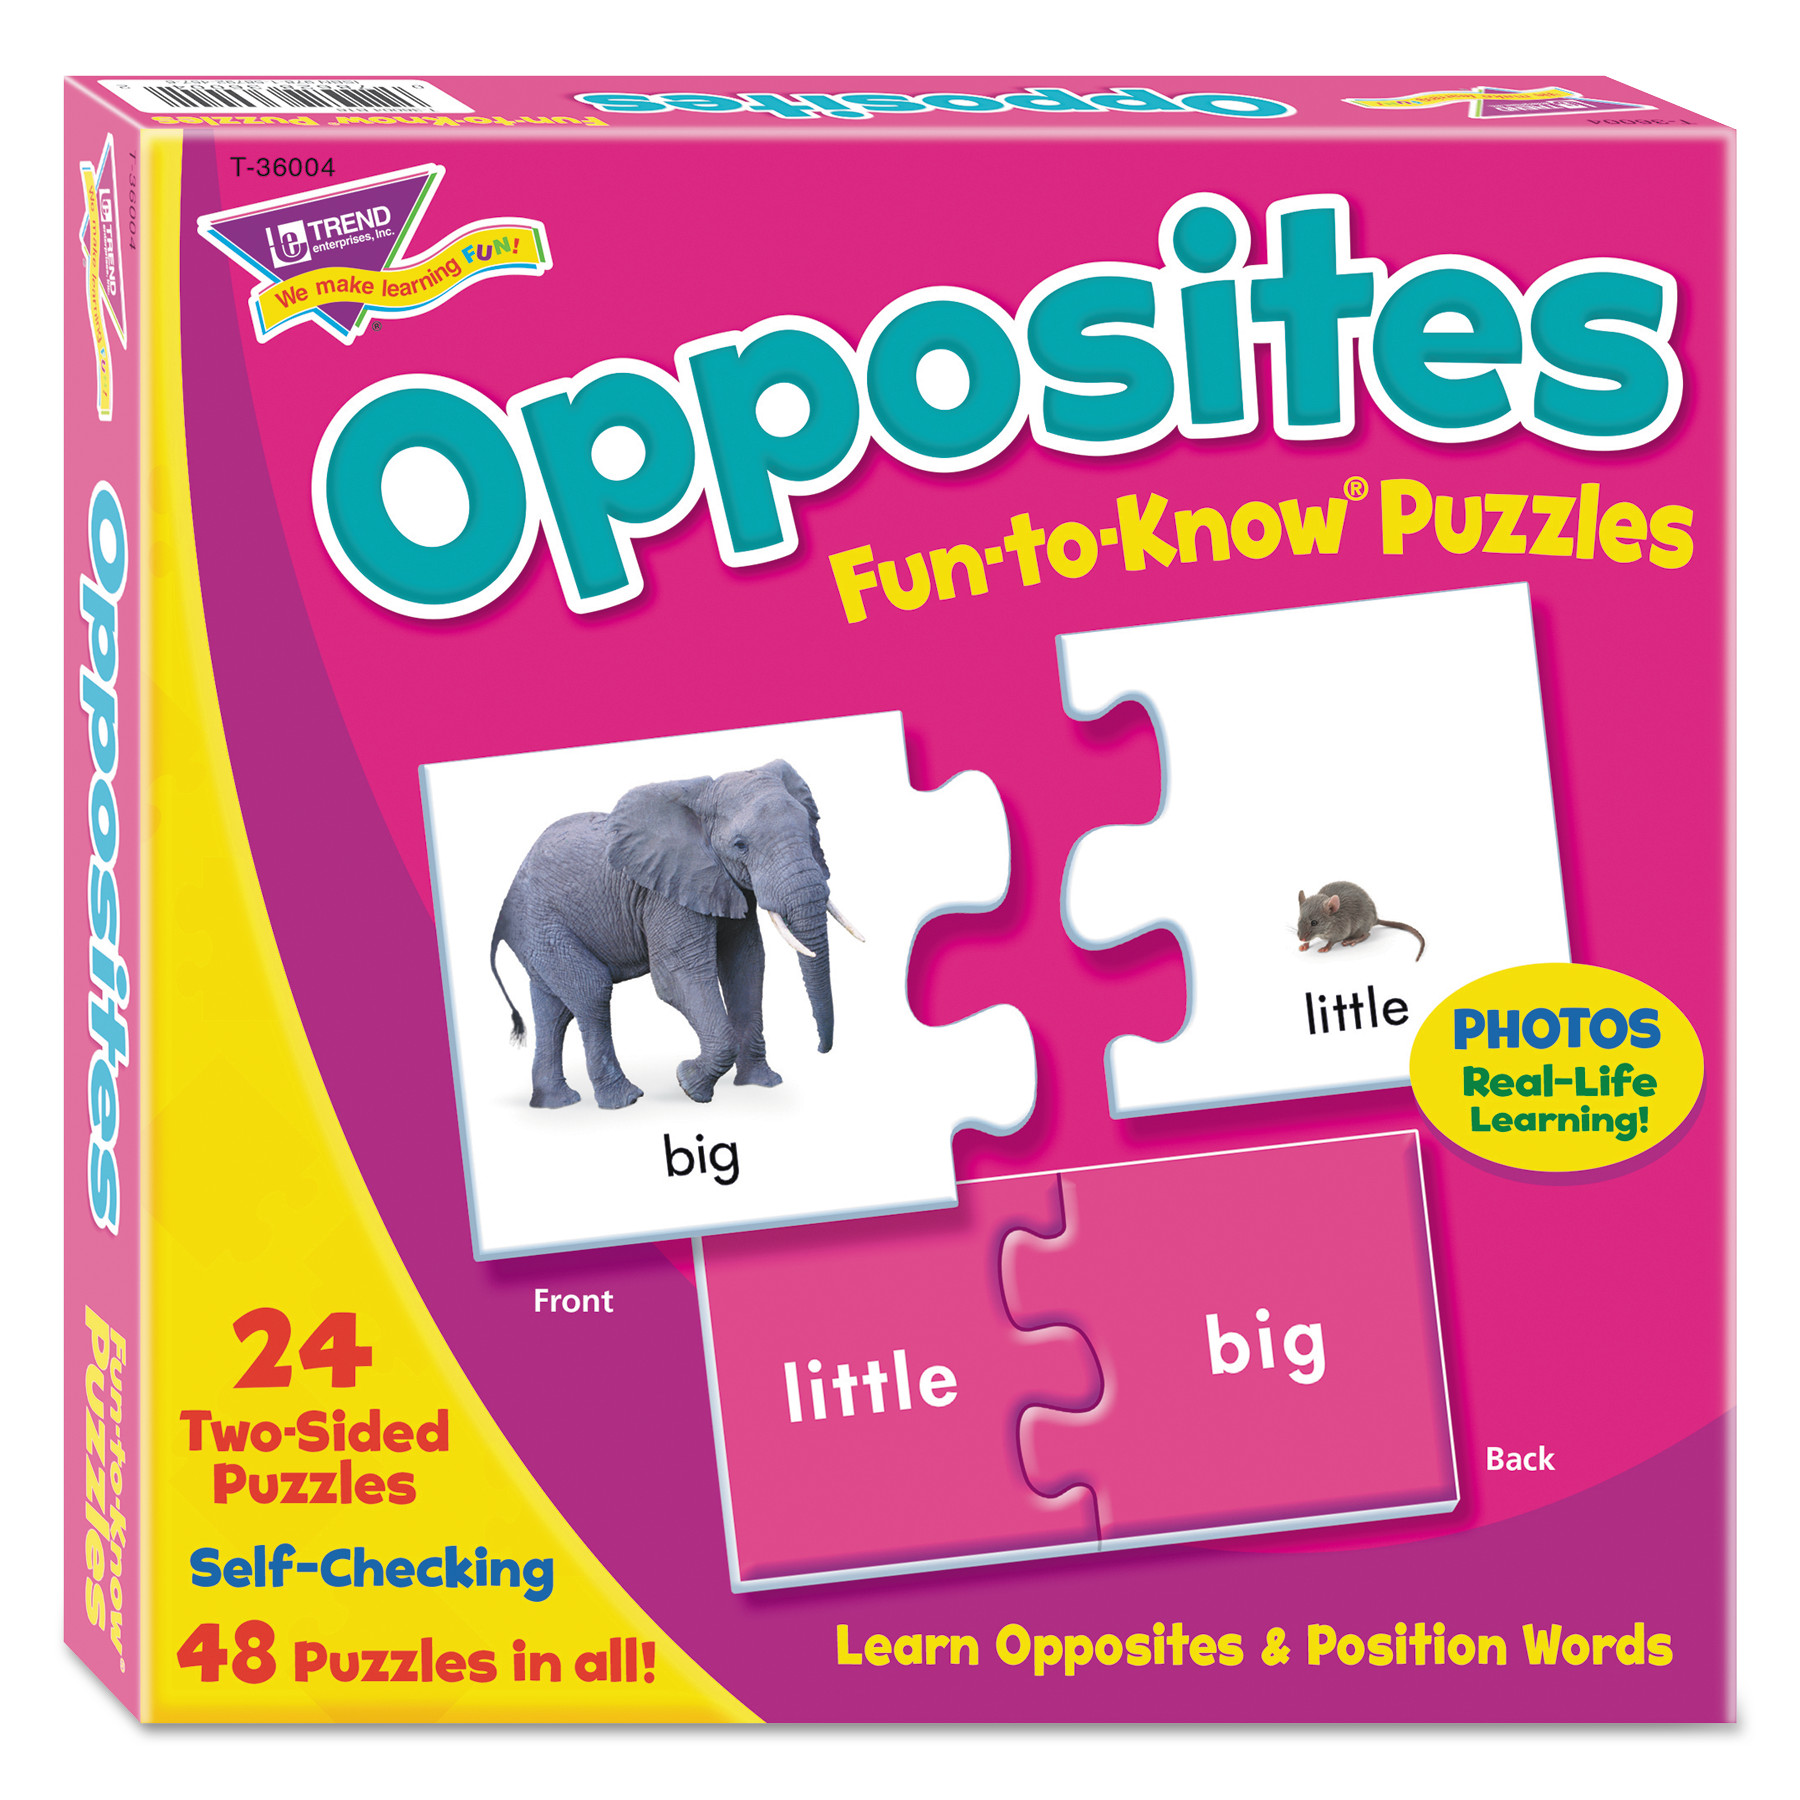 Fun to Know Puzzles, Opposites